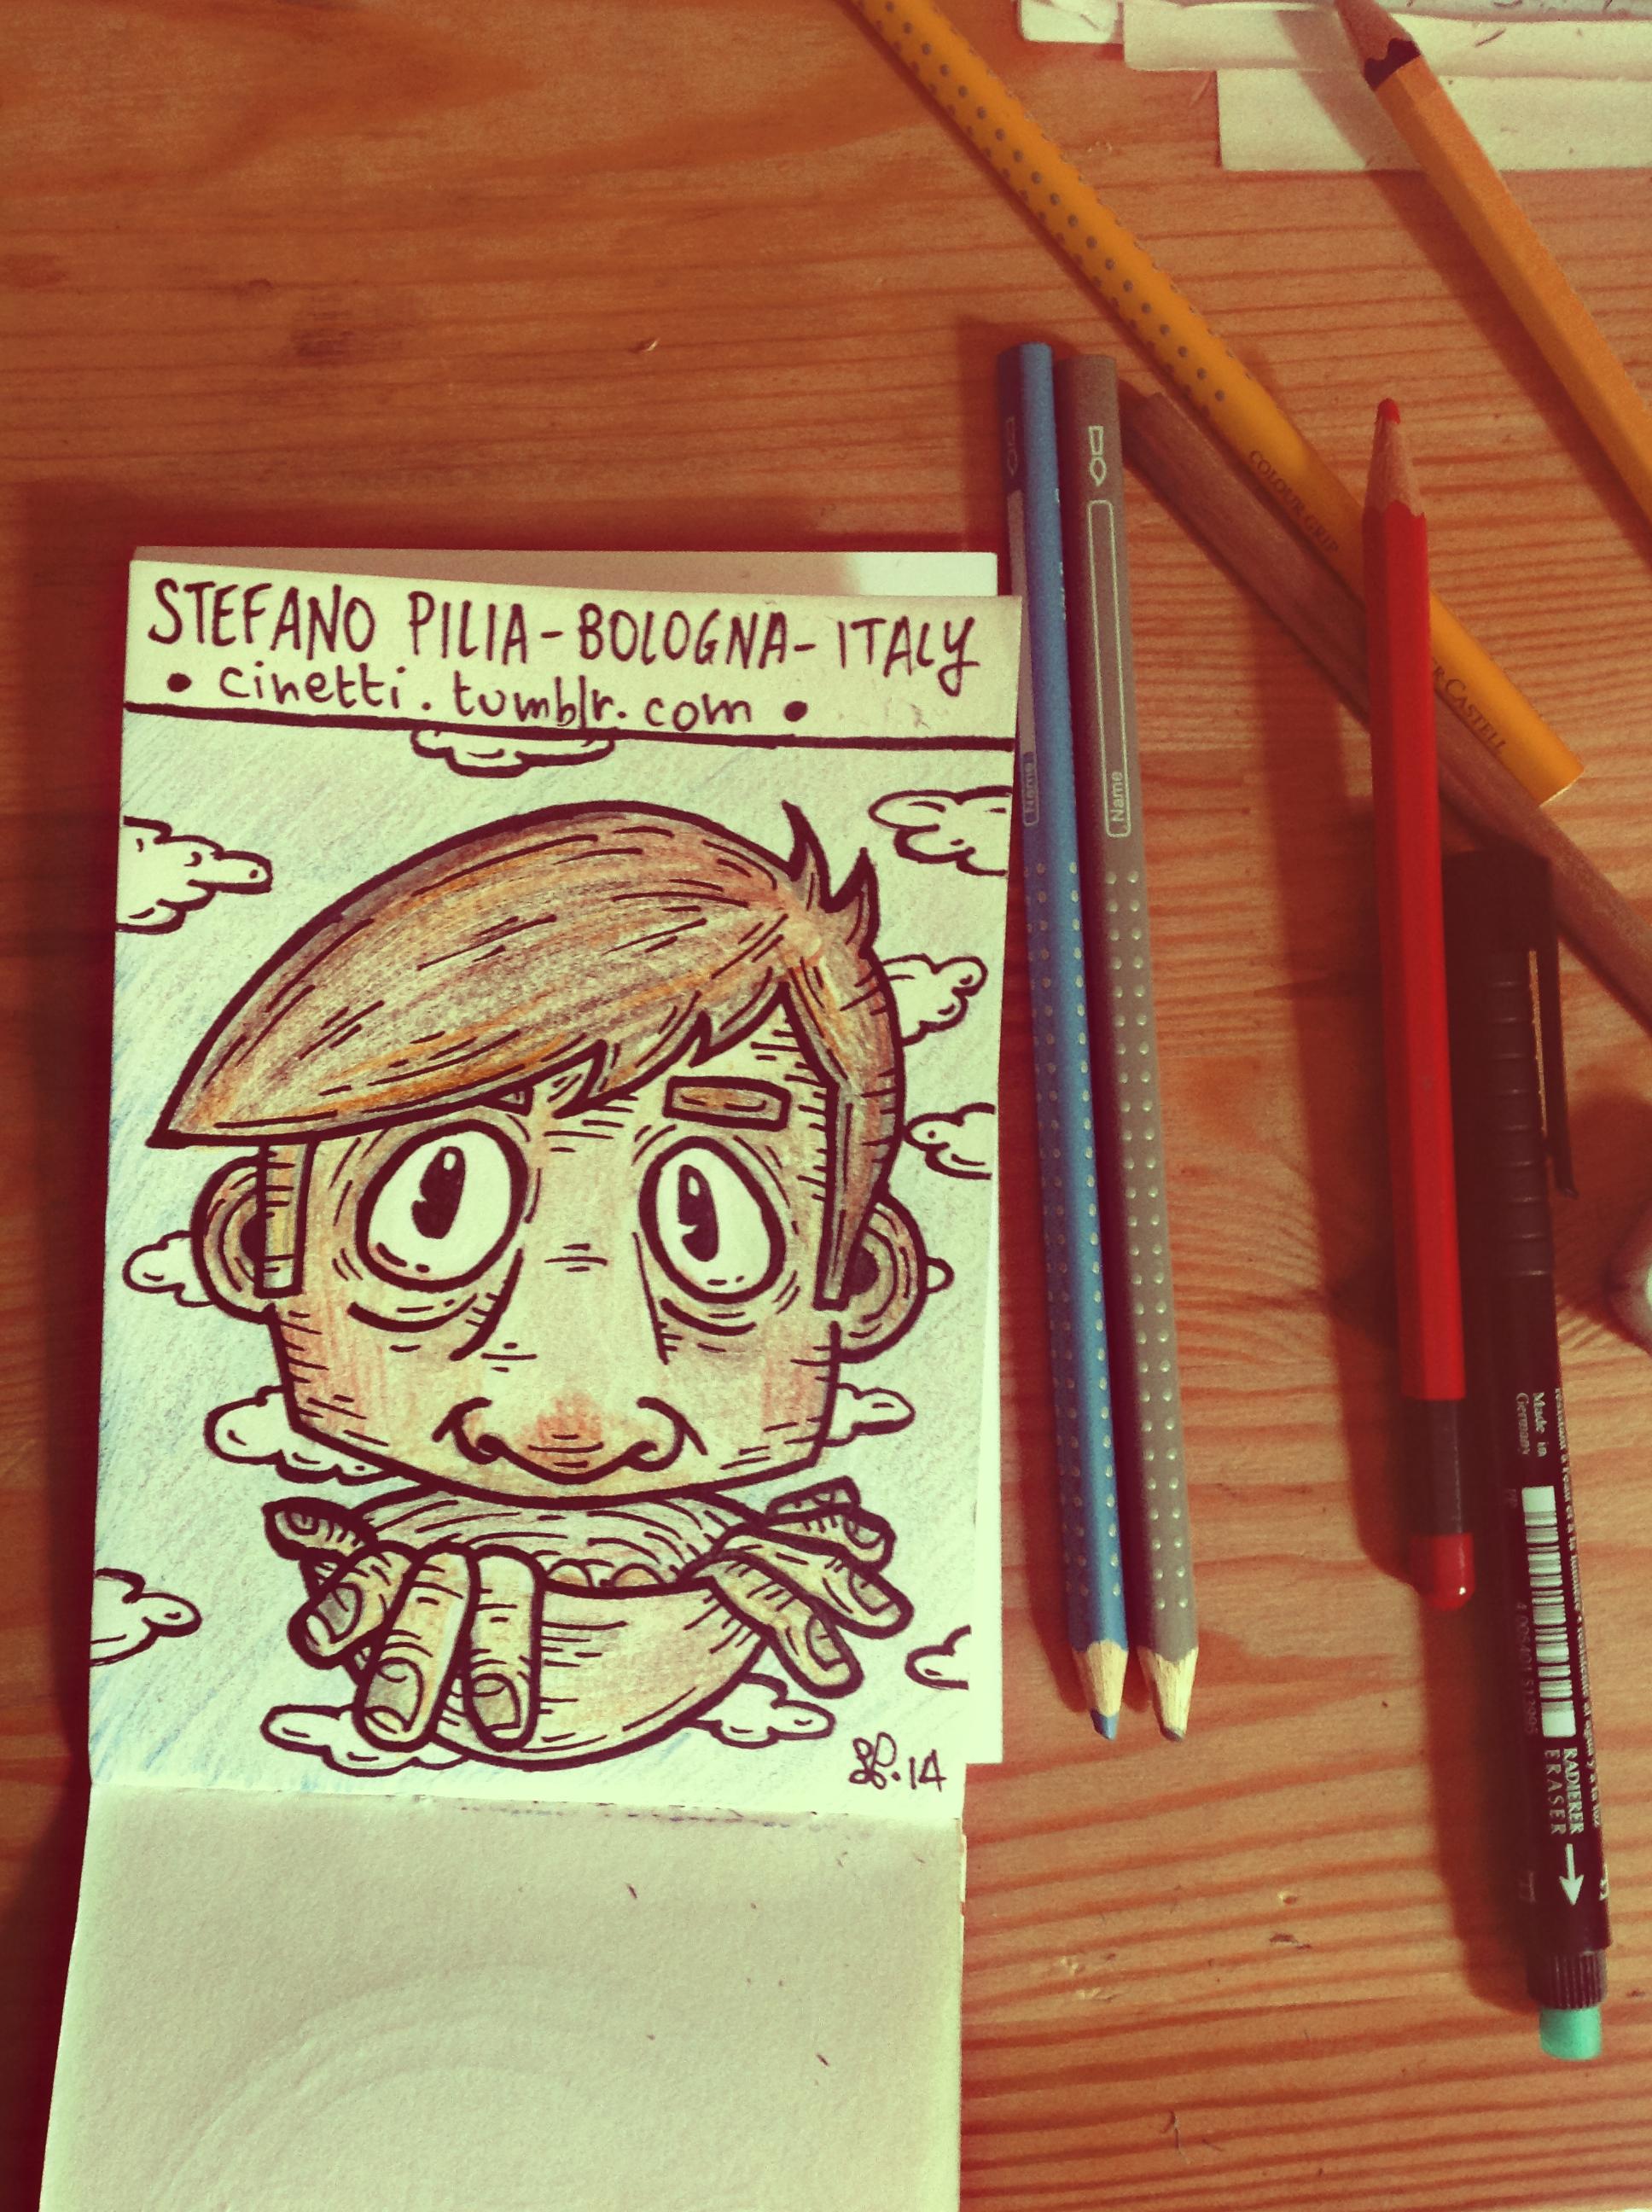 SharingBook_StefanoPilia_Bologna_Italy.jpg.jpg